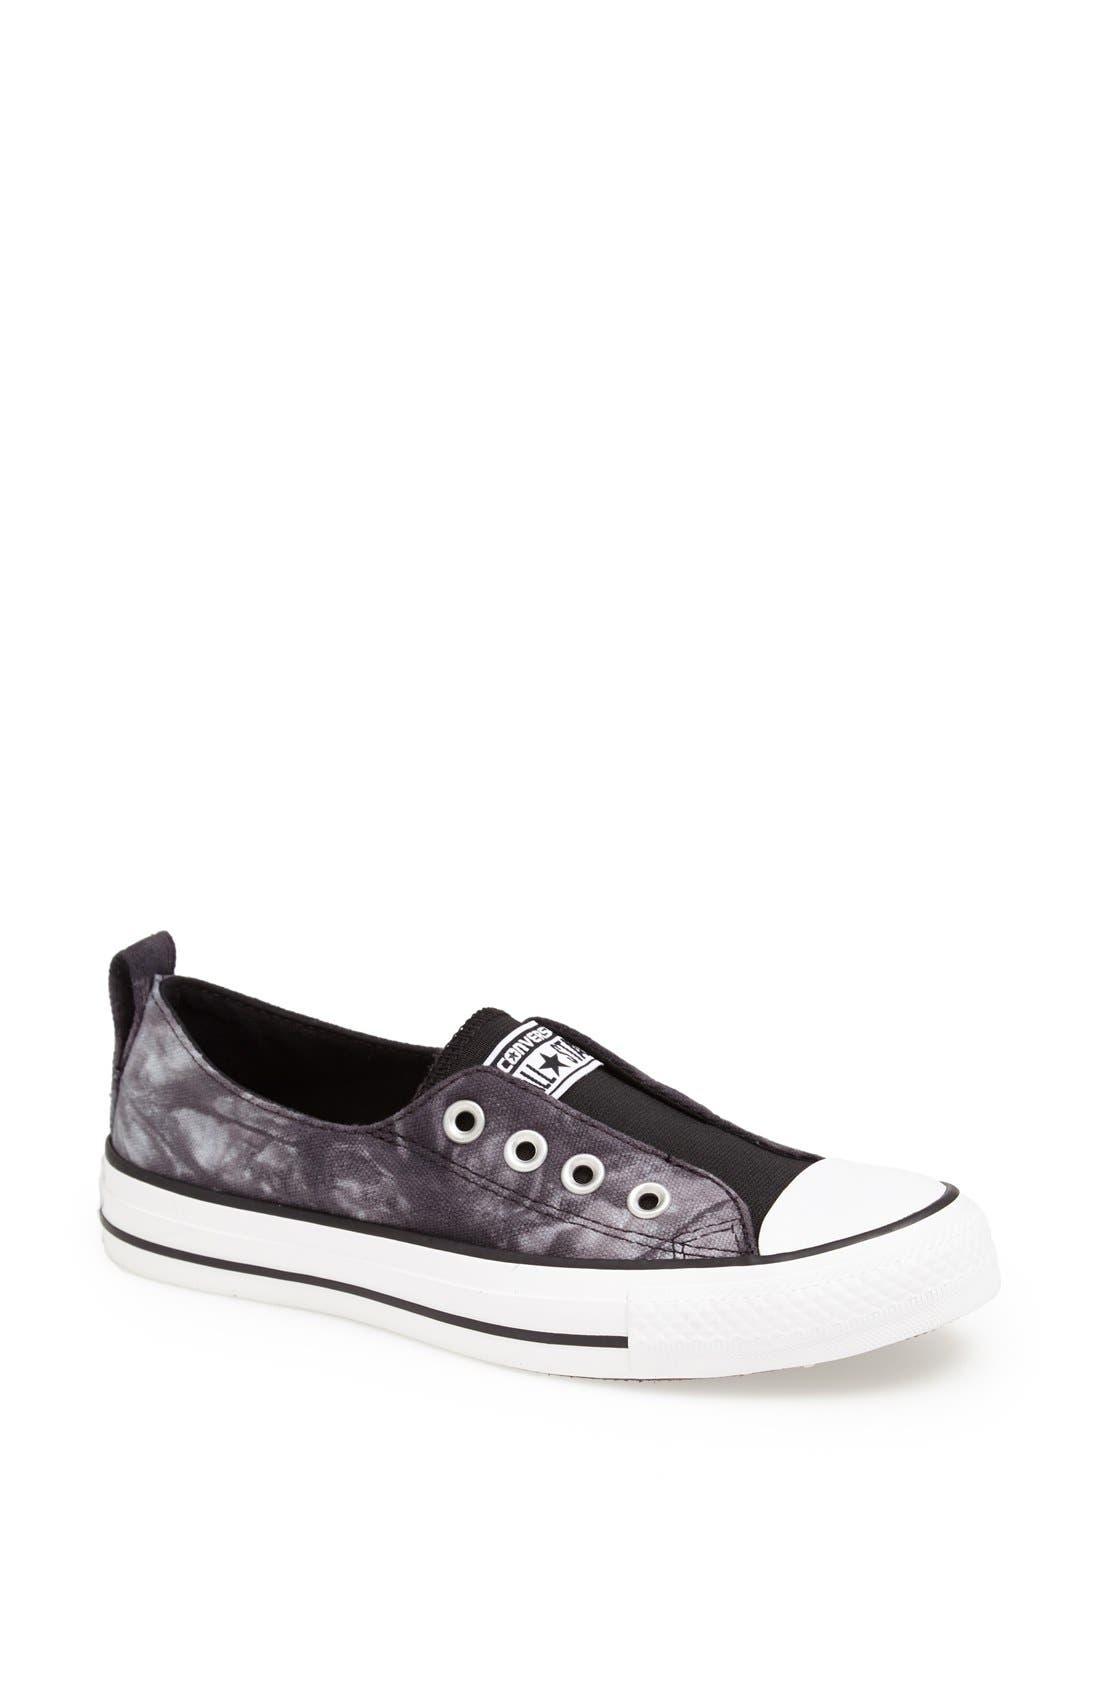 Alternate Image 1 Selected - Converse Chuck Taylor® 'Goreline' Sneaker (Women)